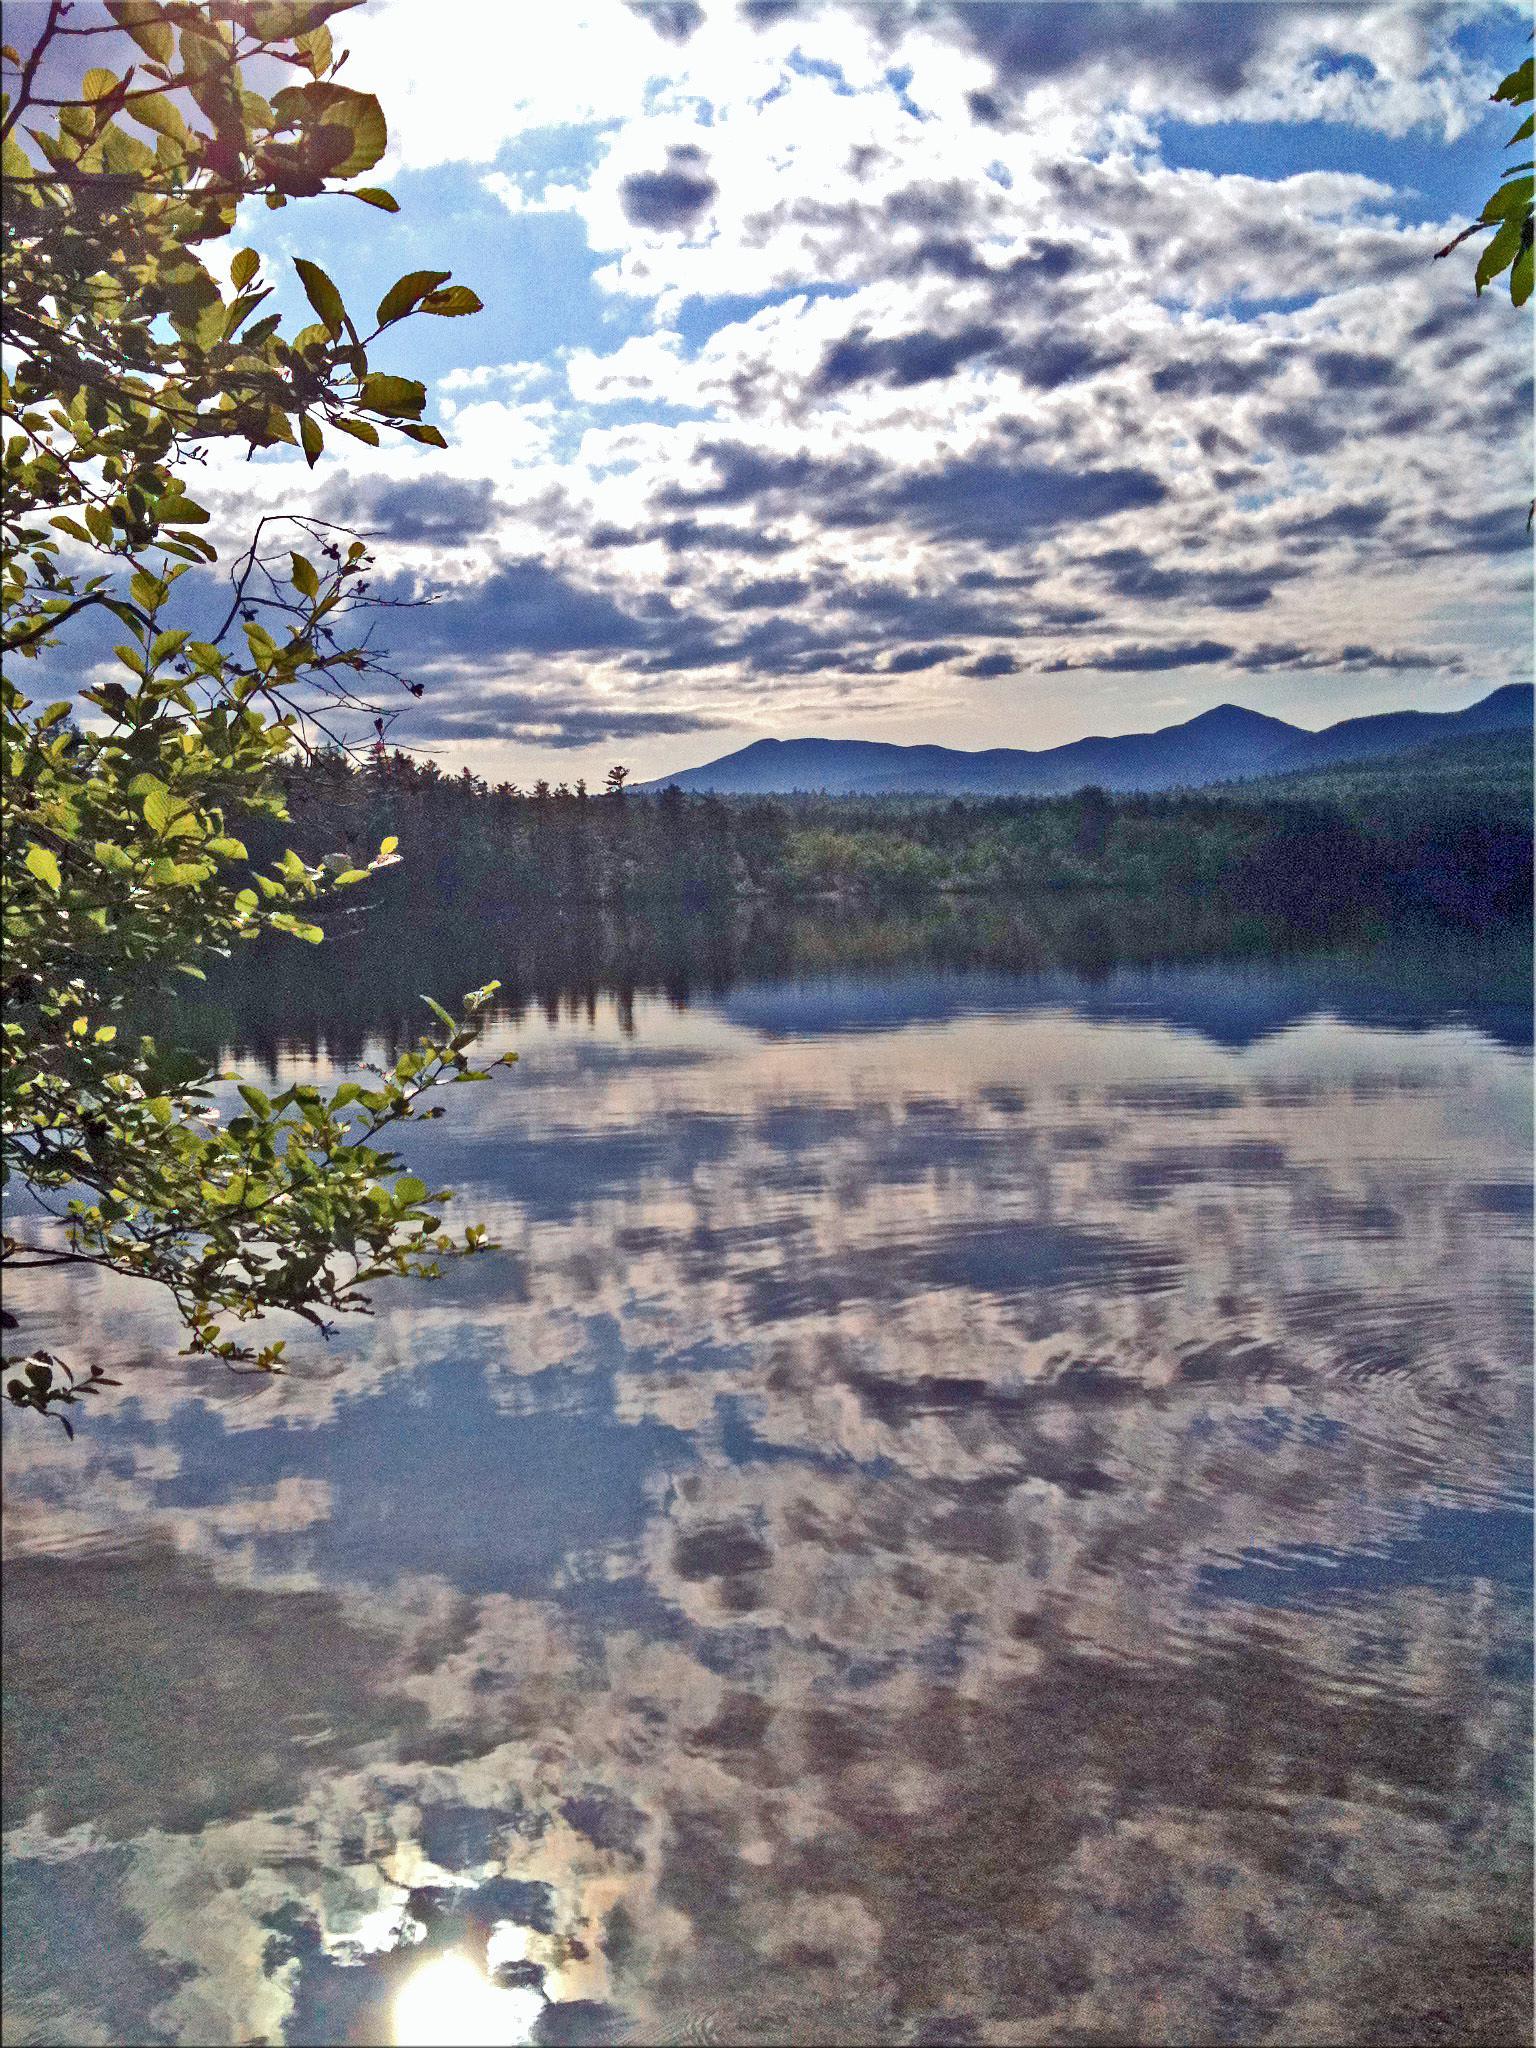 Clouds on water by SassieKatt